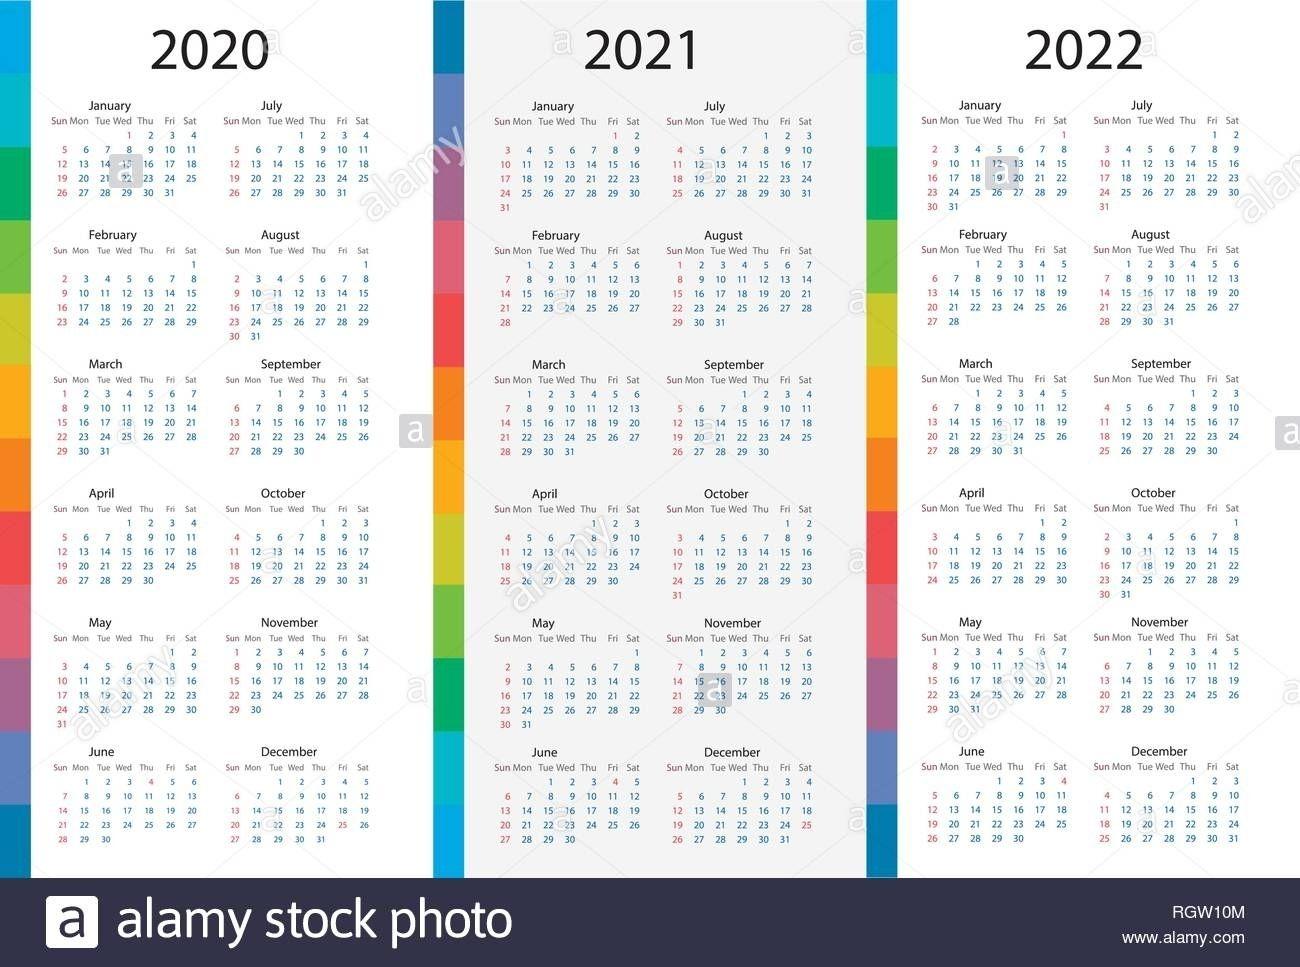 4 Year Calendar 2020 To 2022 | Month Calendar Printable